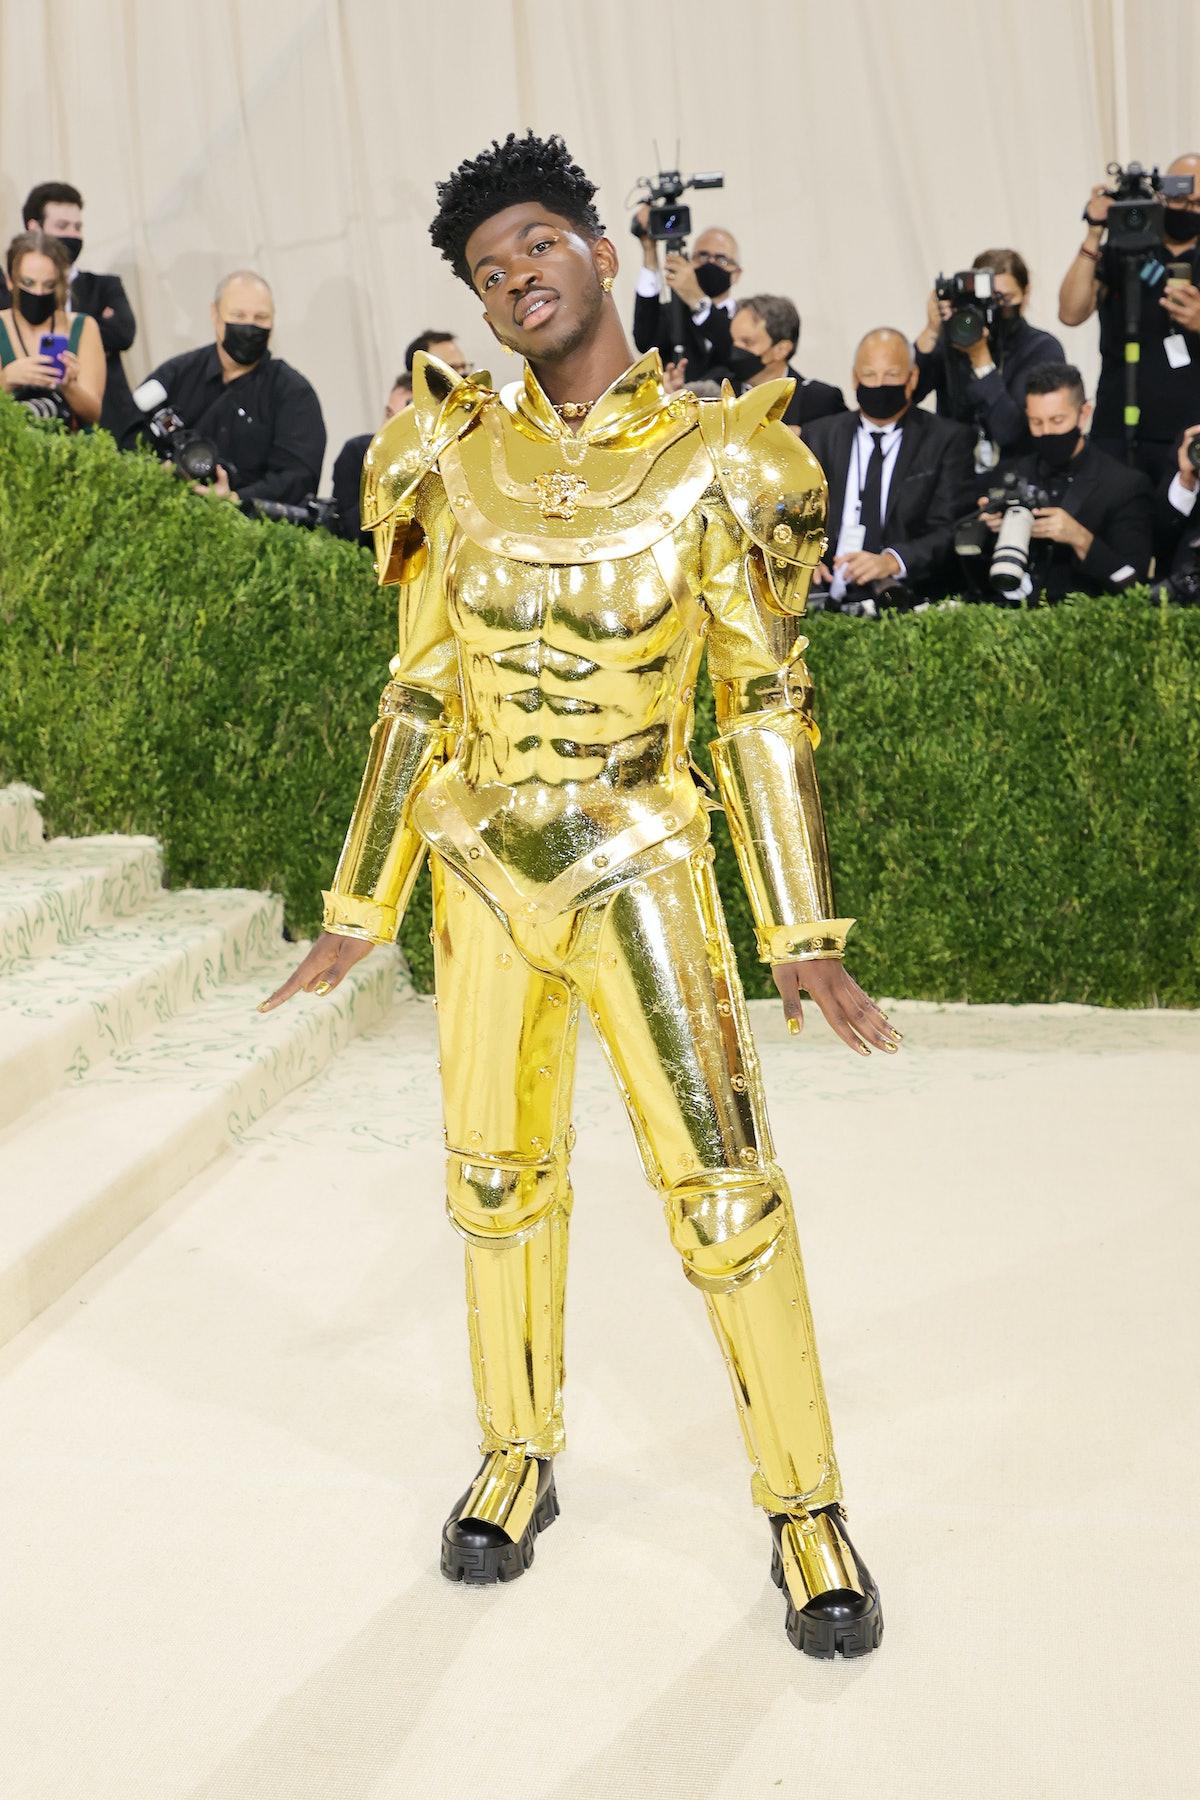 Lil Nas X's second Met Gala look designed by Versace.